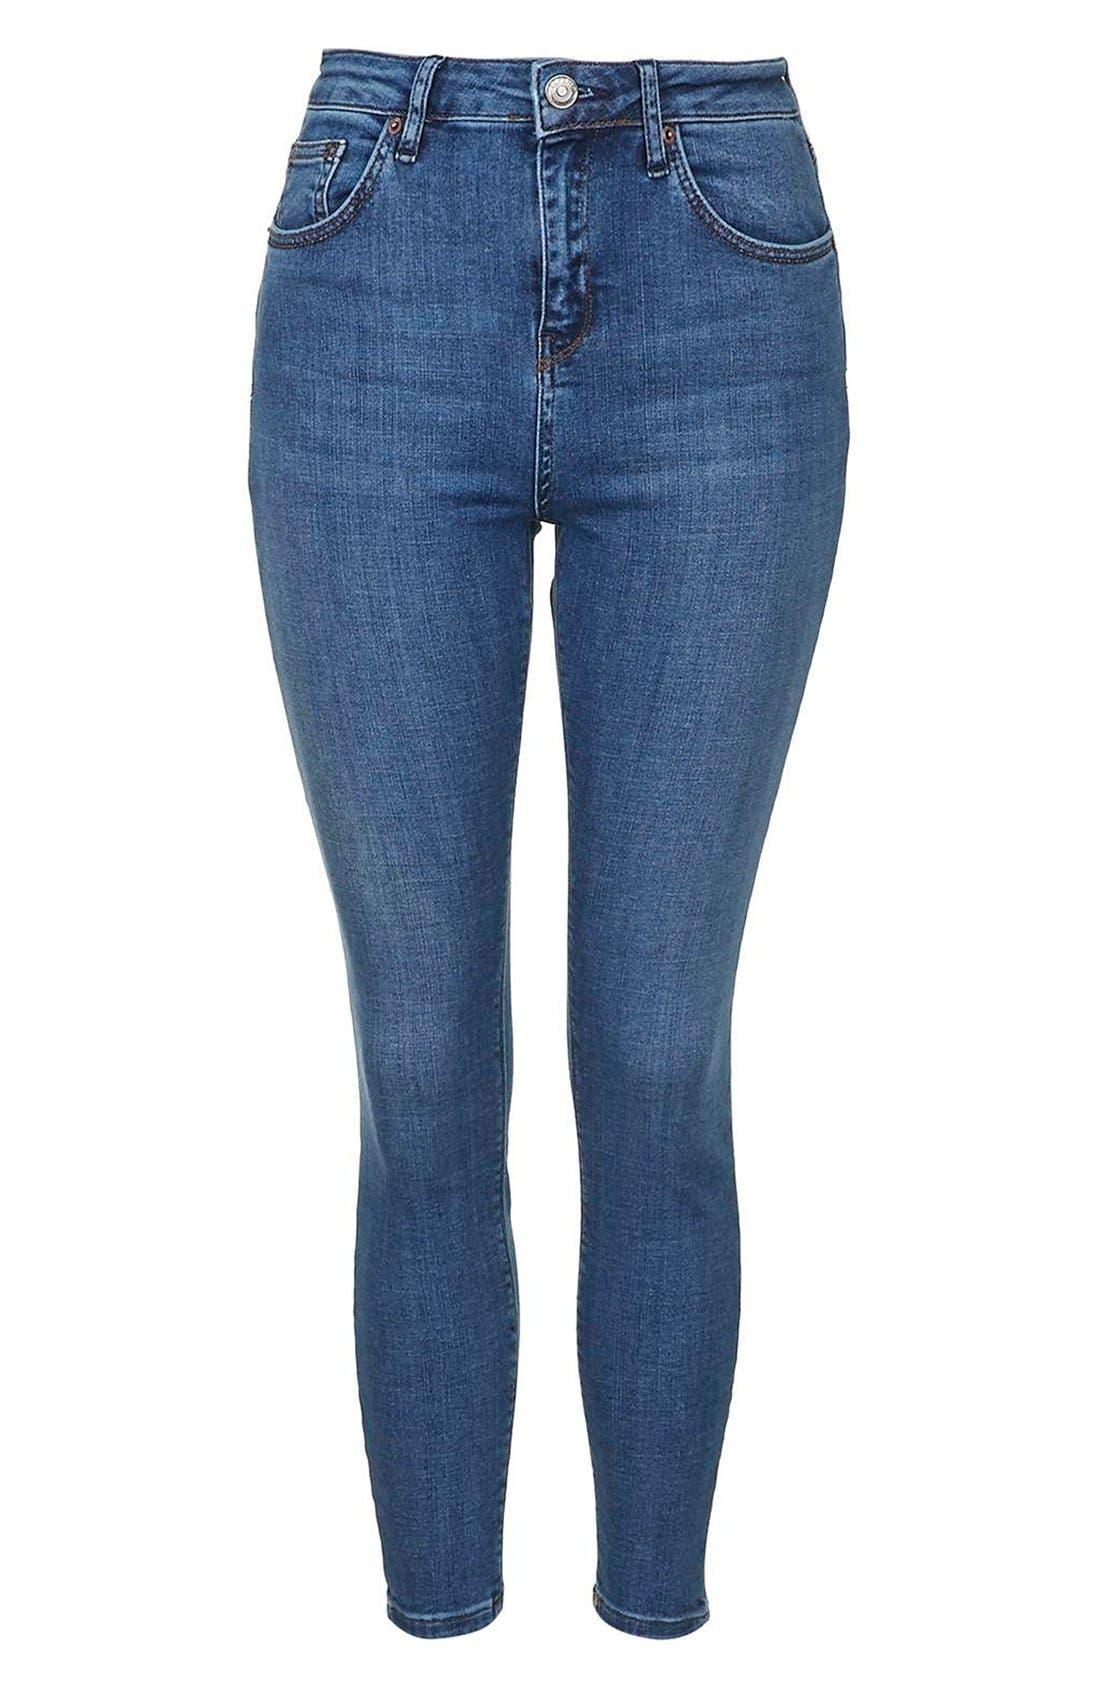 Alternate Image 3  - Topshop Moto 'Cain' High Rise Ankle Jeans (Blue) (Short)